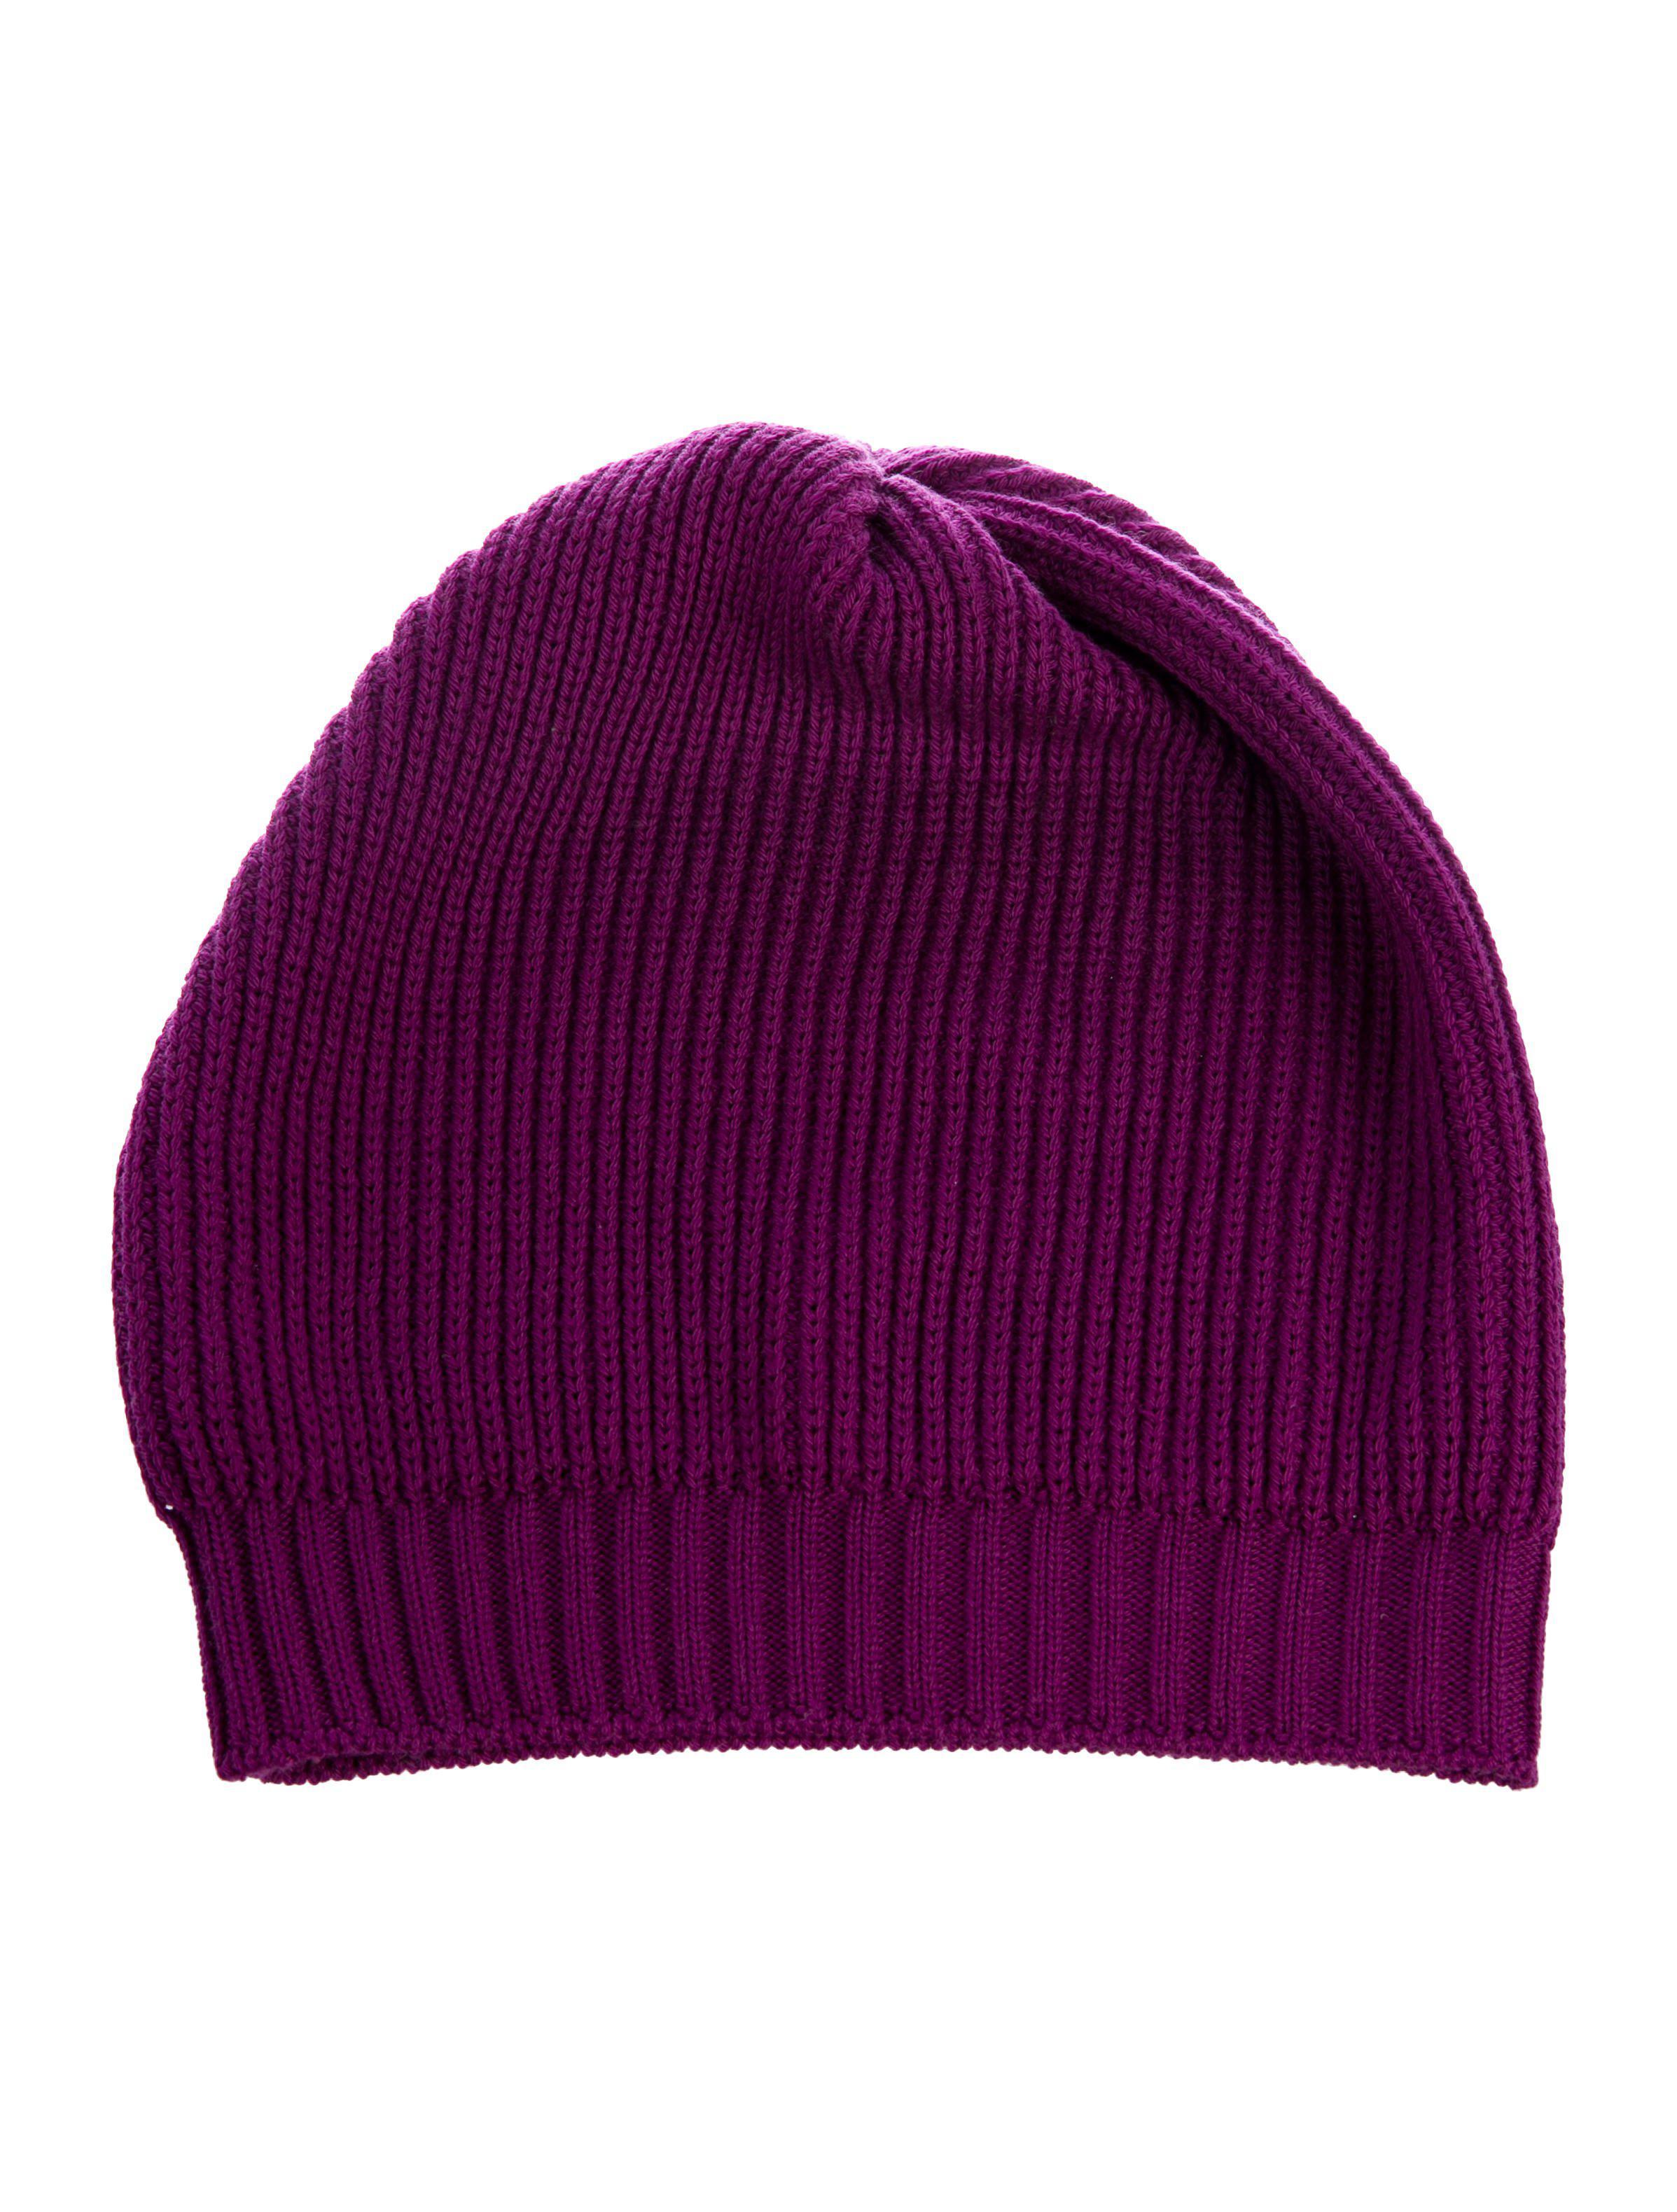 5452d2c6fe1 Lyst - Missoni Knit Wool Beanie Violet in Purple